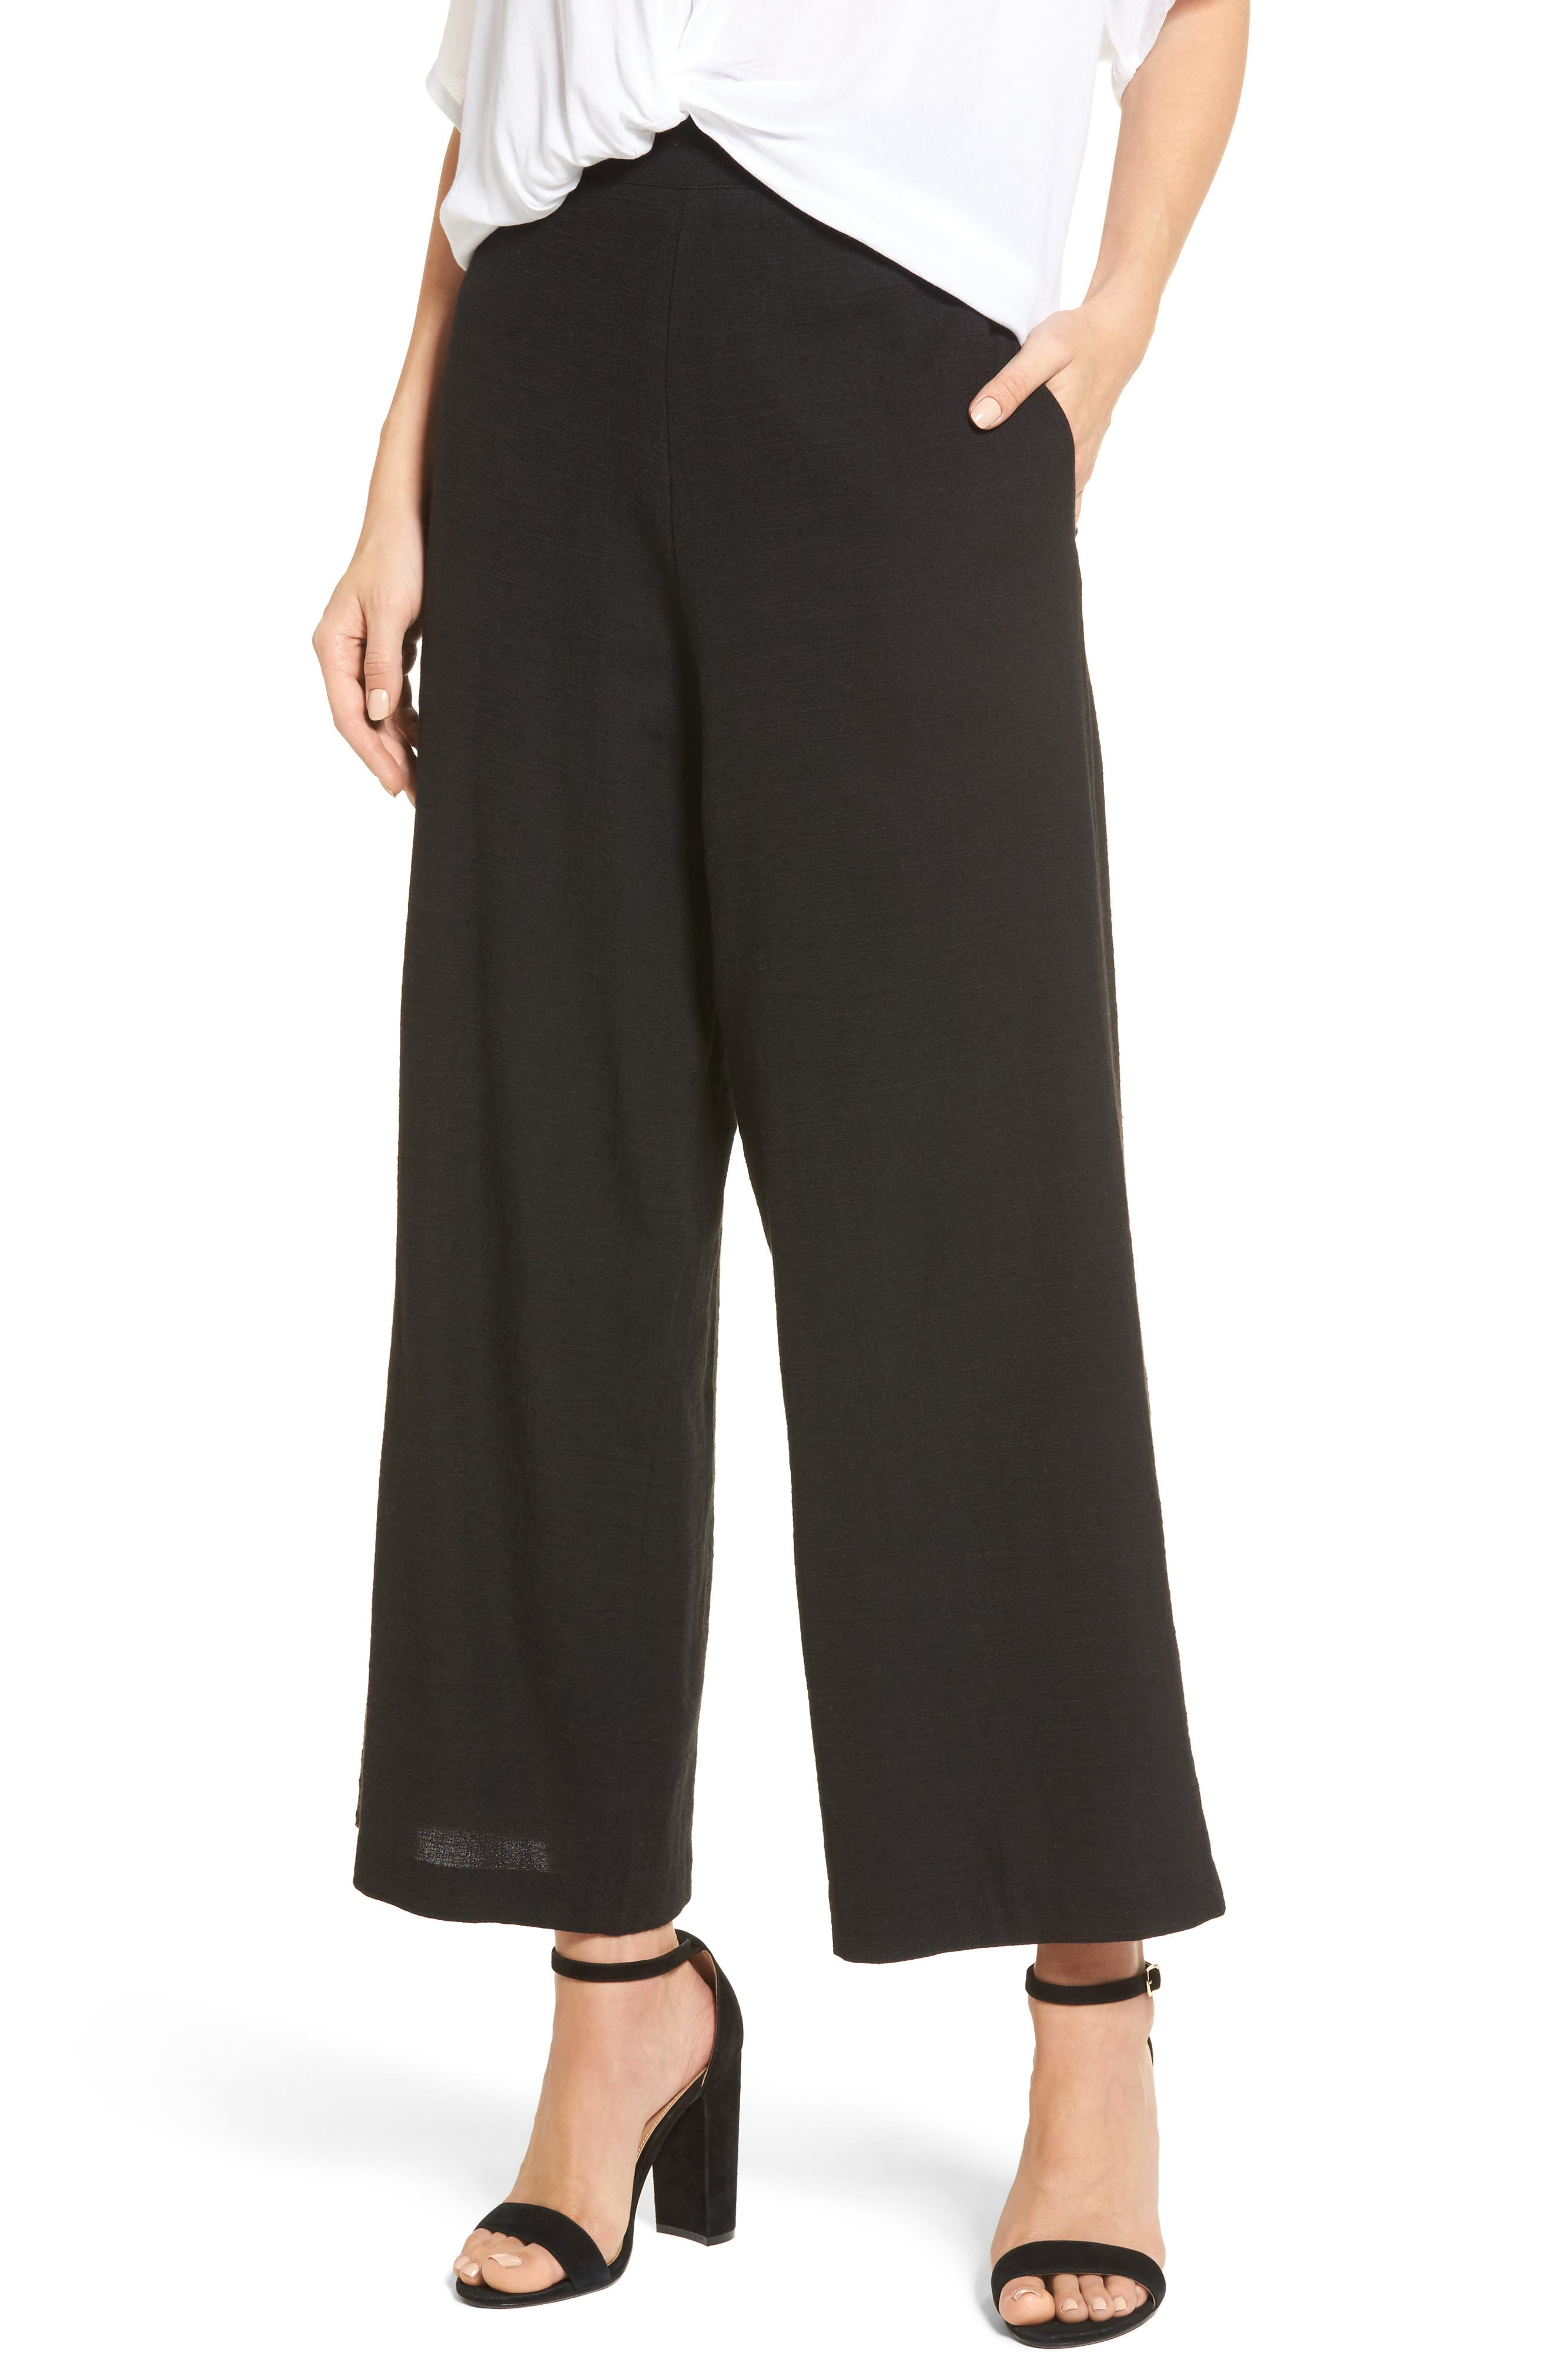 StyleKeepers Montauk High Waist Culottes